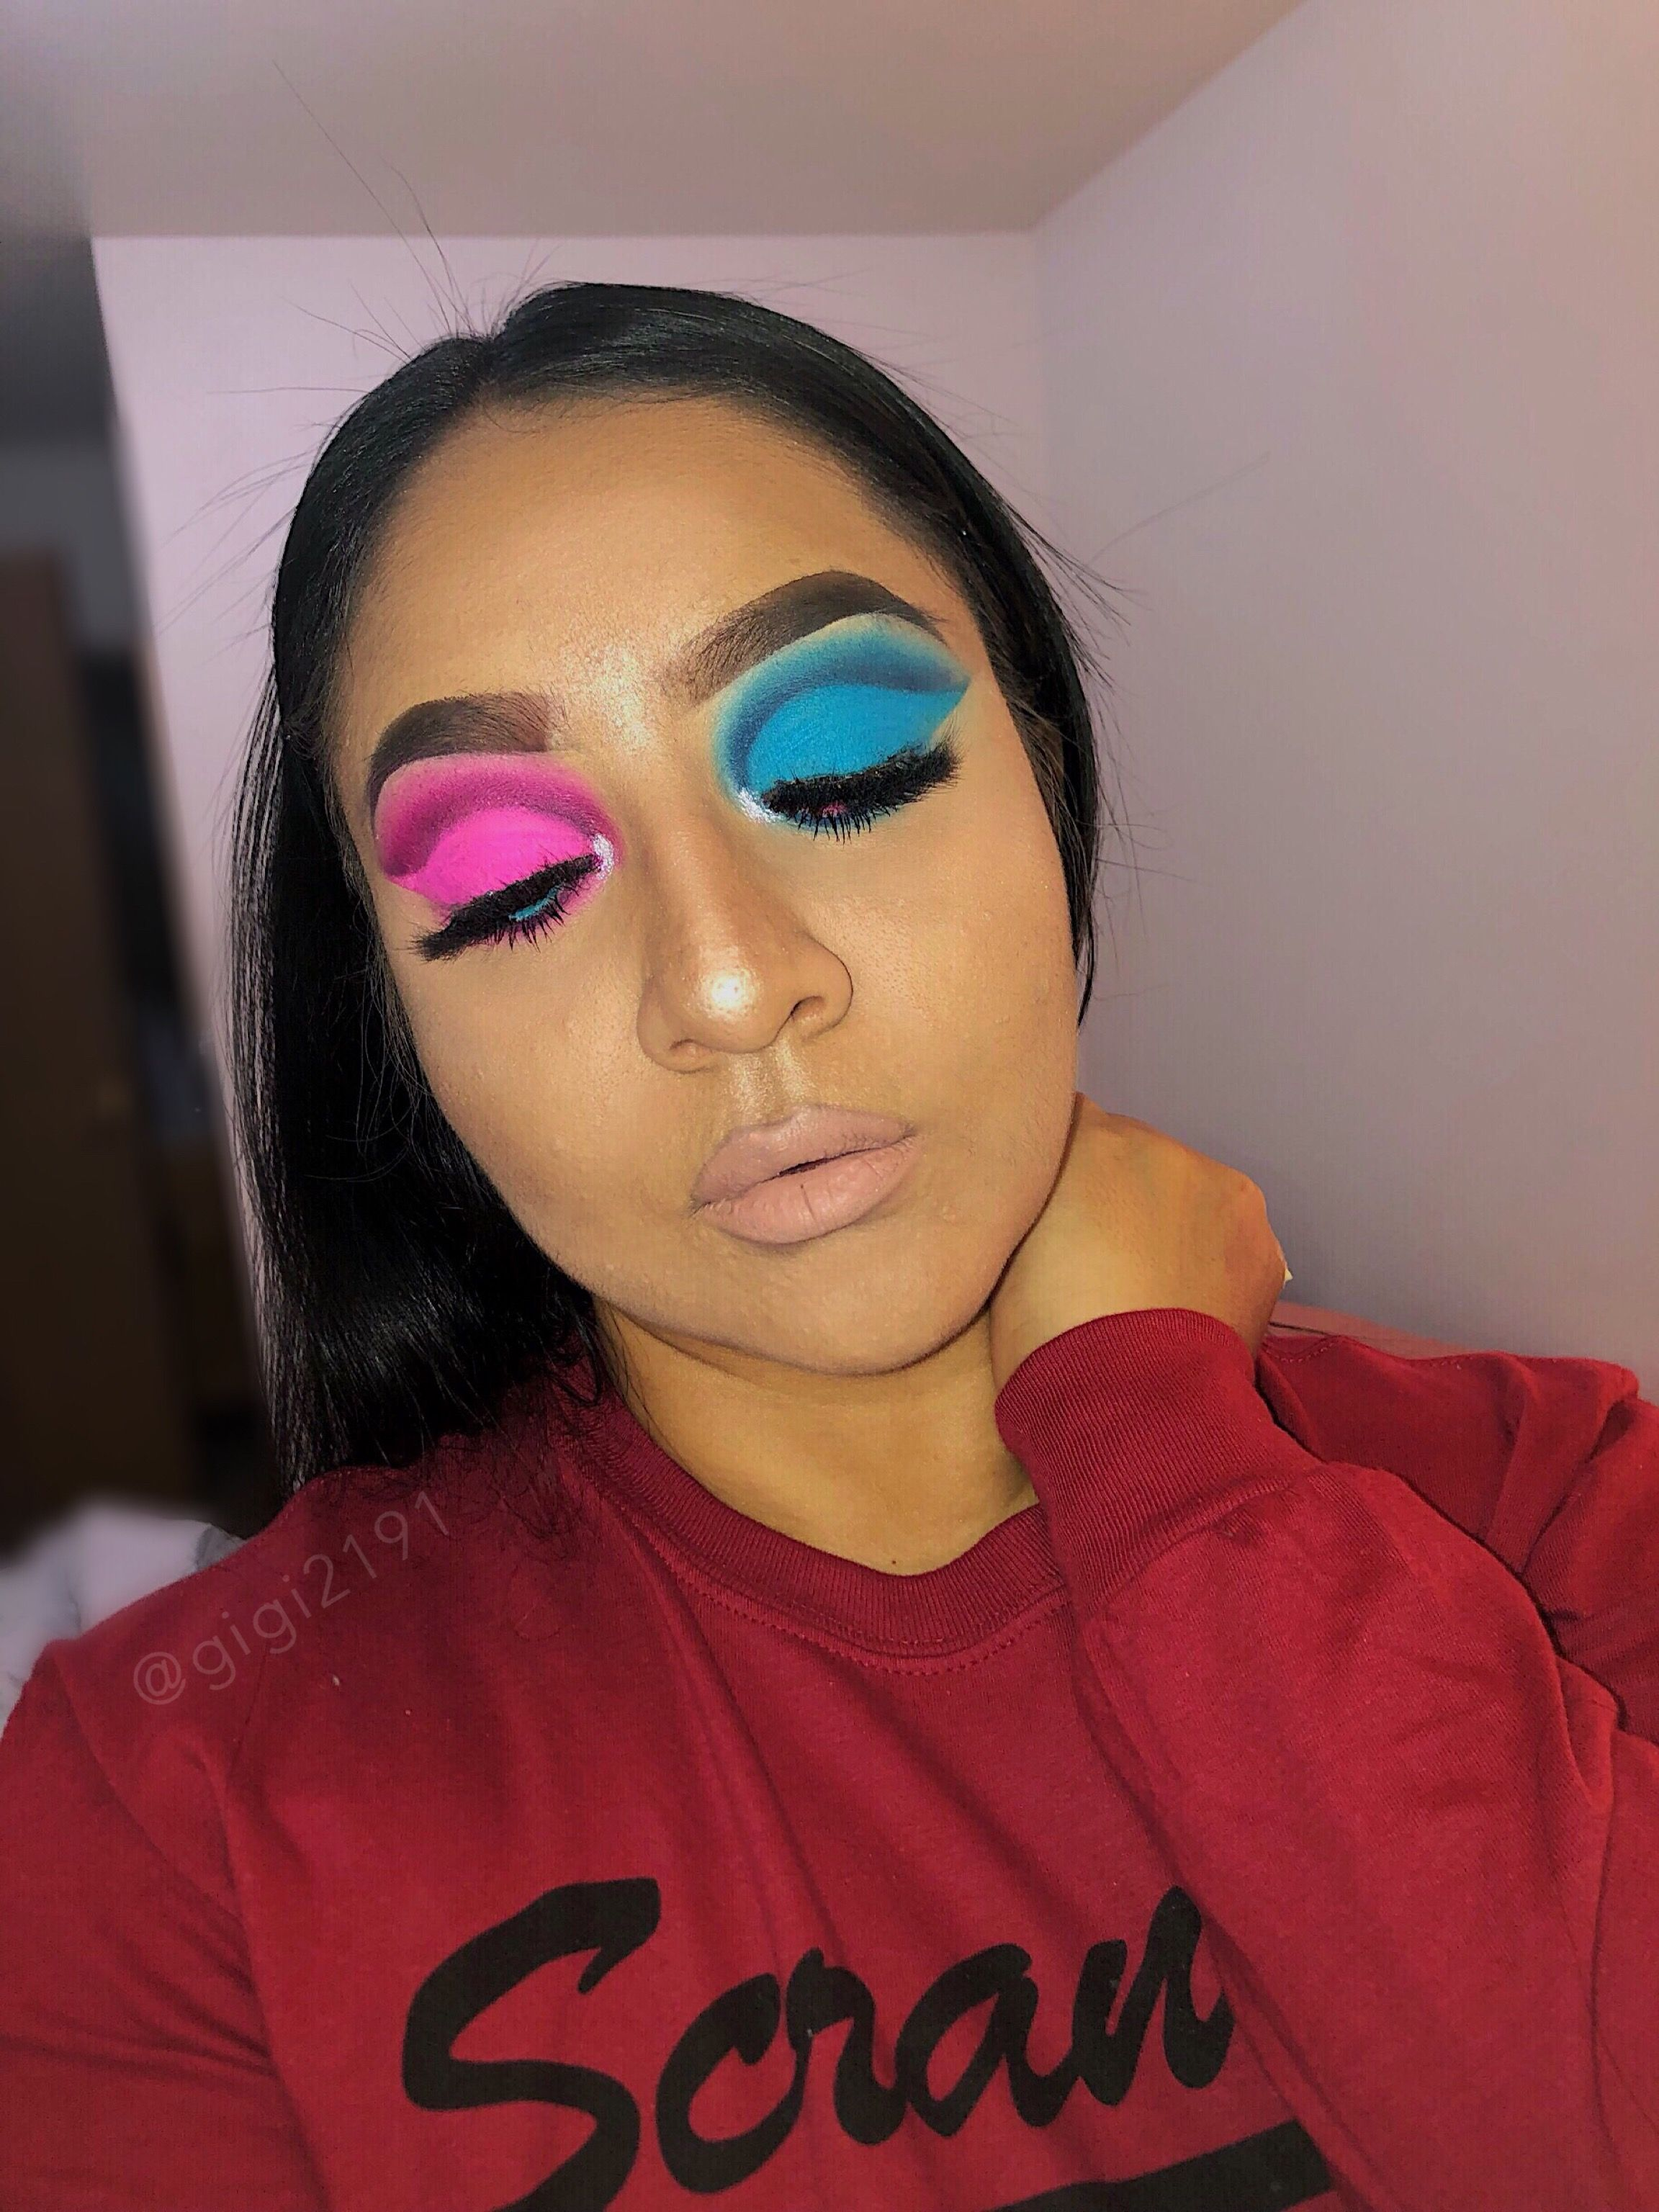 Gender Reveal Inspired Makeup James Charles Palette Makeup 0 In